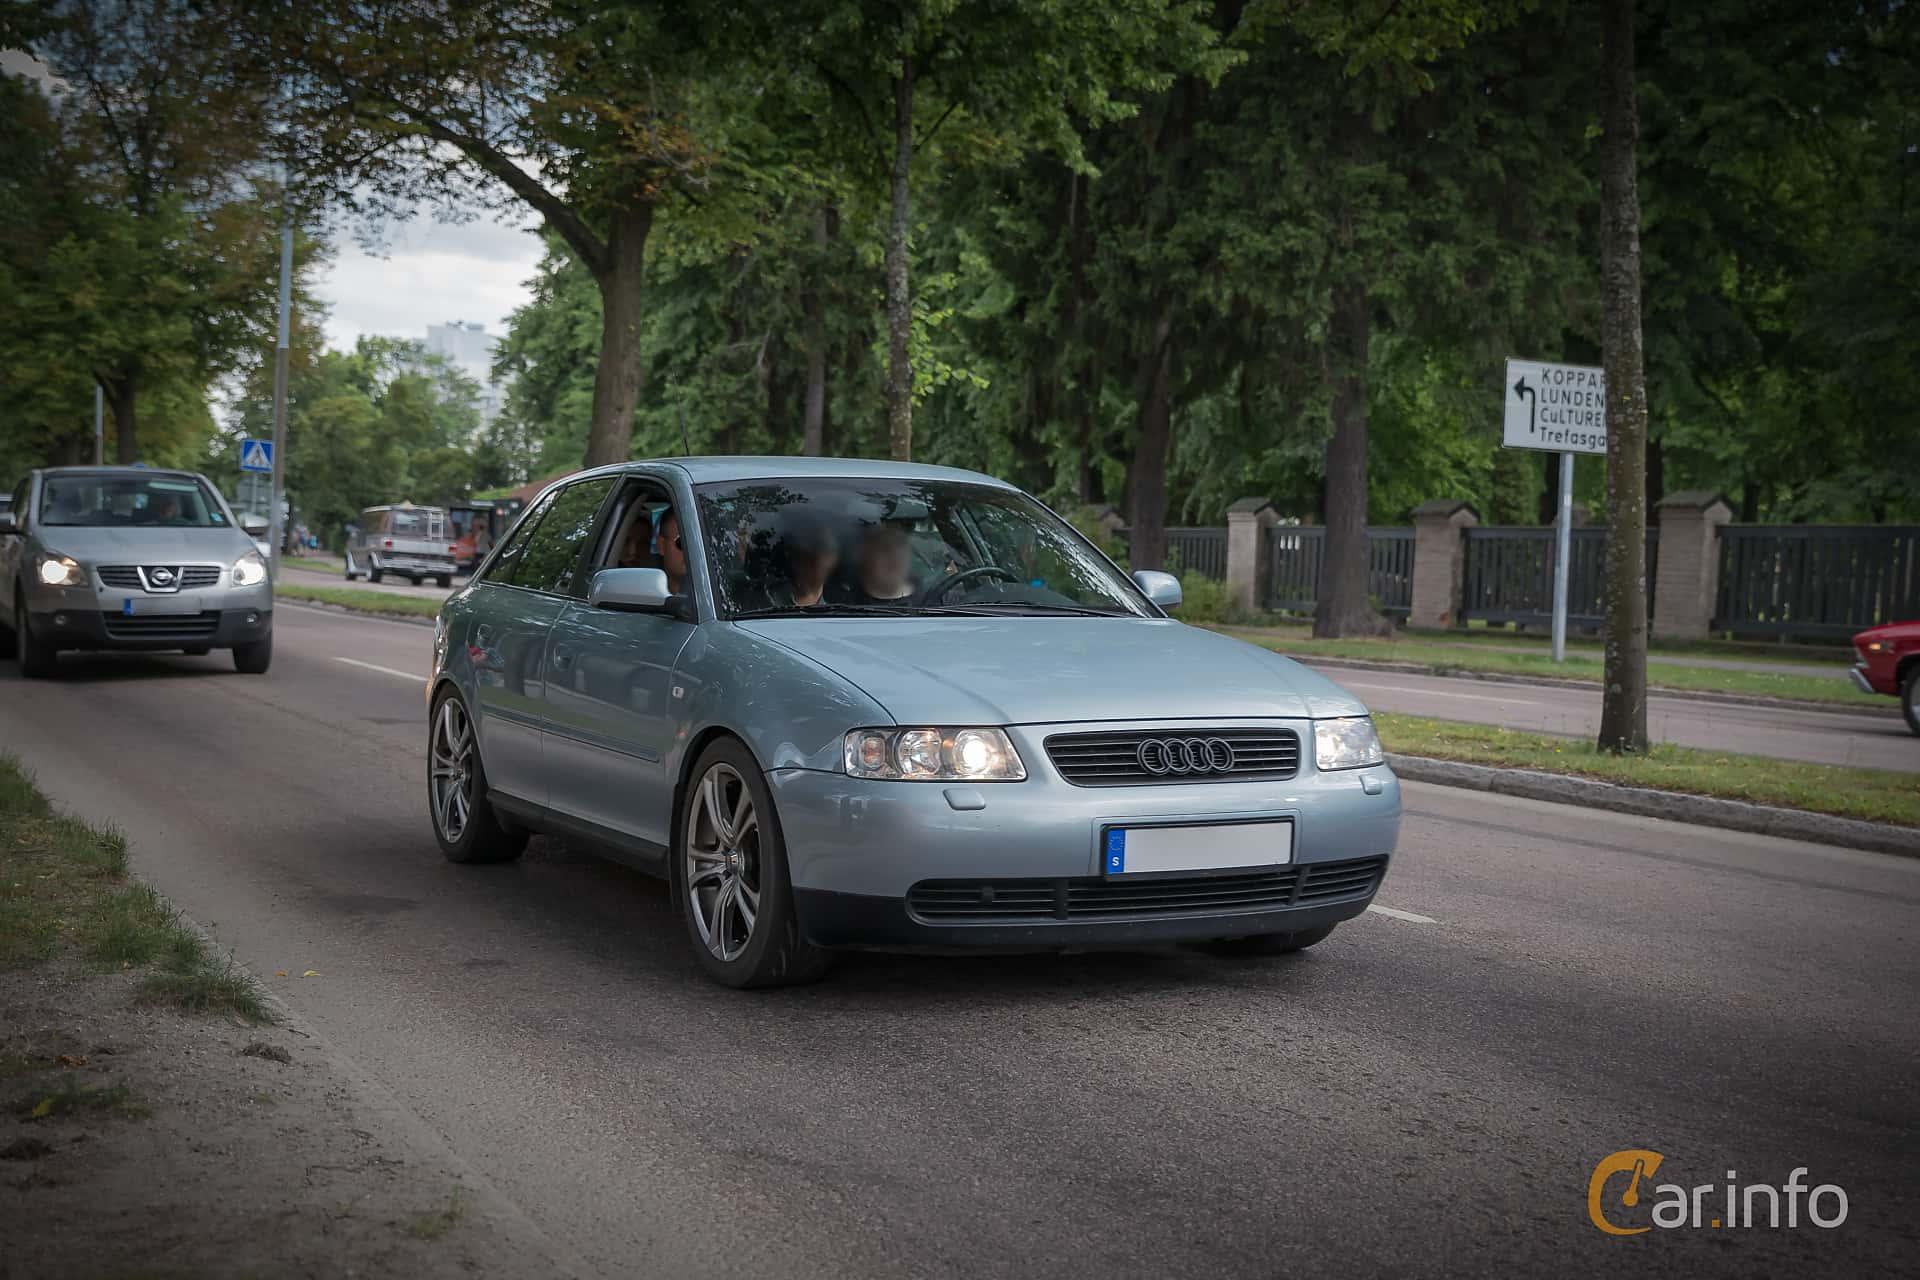 Kelebihan Kekurangan Audi A3 2002 Murah Berkualitas